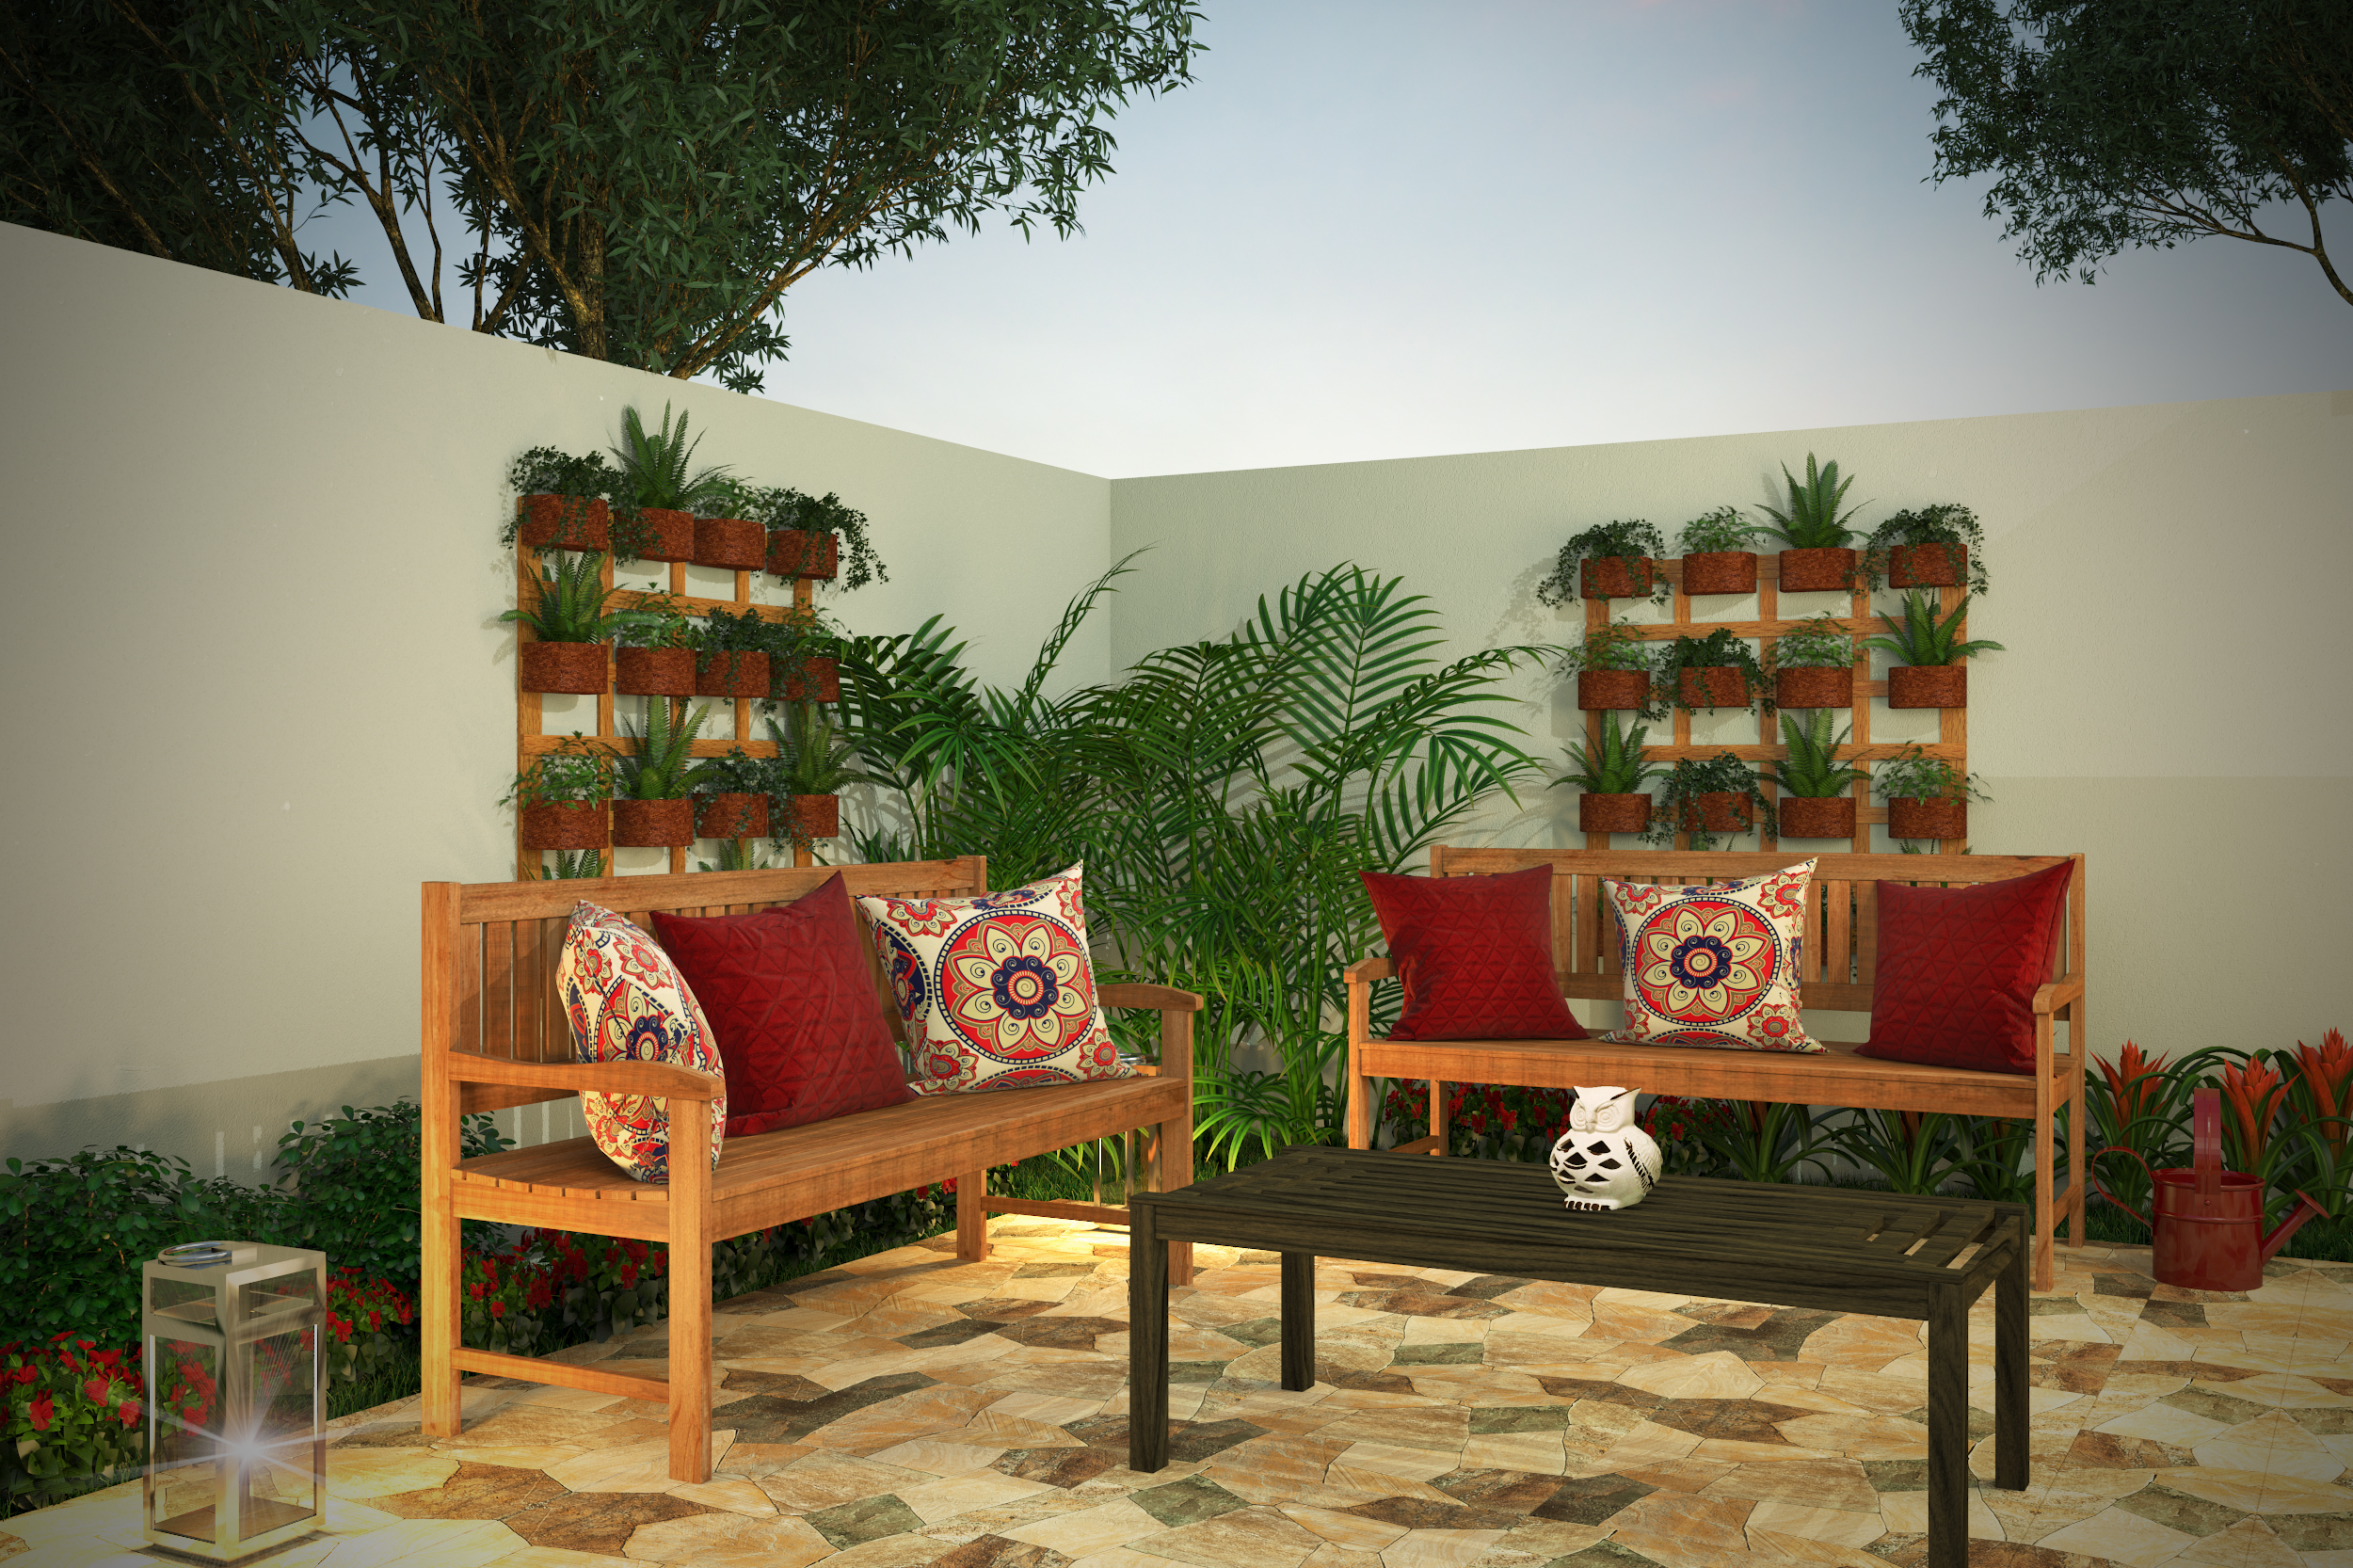 Ferramentas Manuais para Jardim em Oferta | Leroy Merlin on